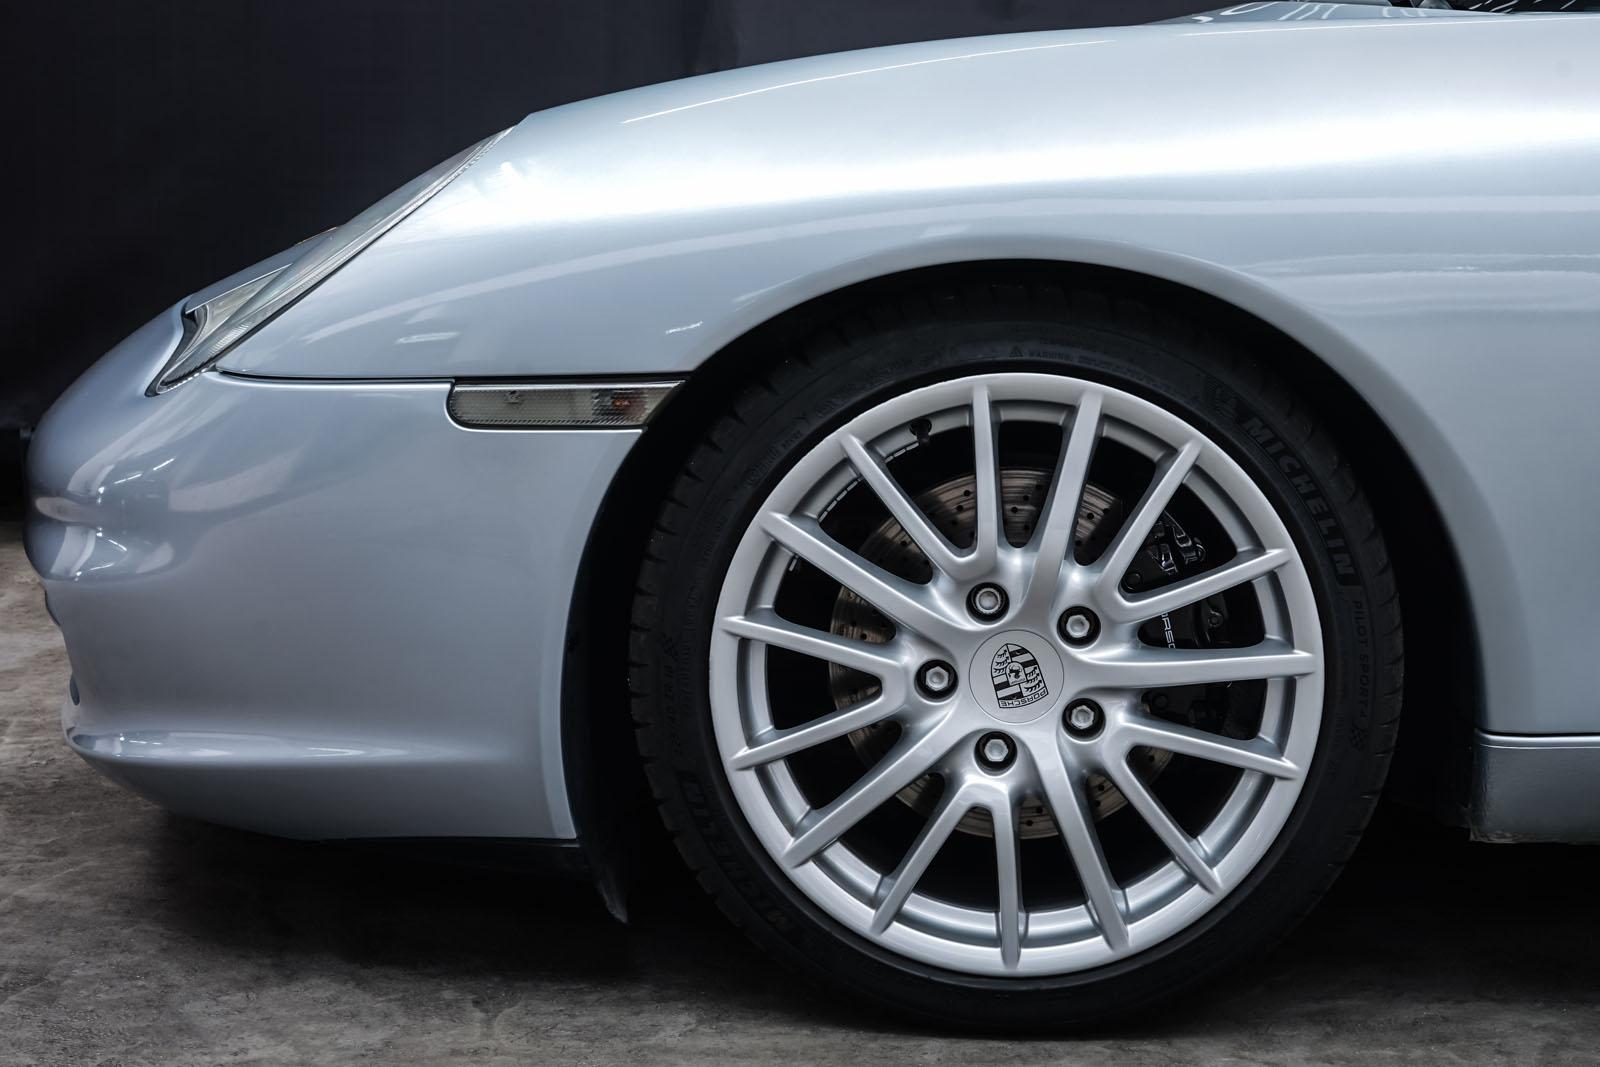 Porsche_996_Cabrio_Silber_Dunkelblau_POR-1724_3_w